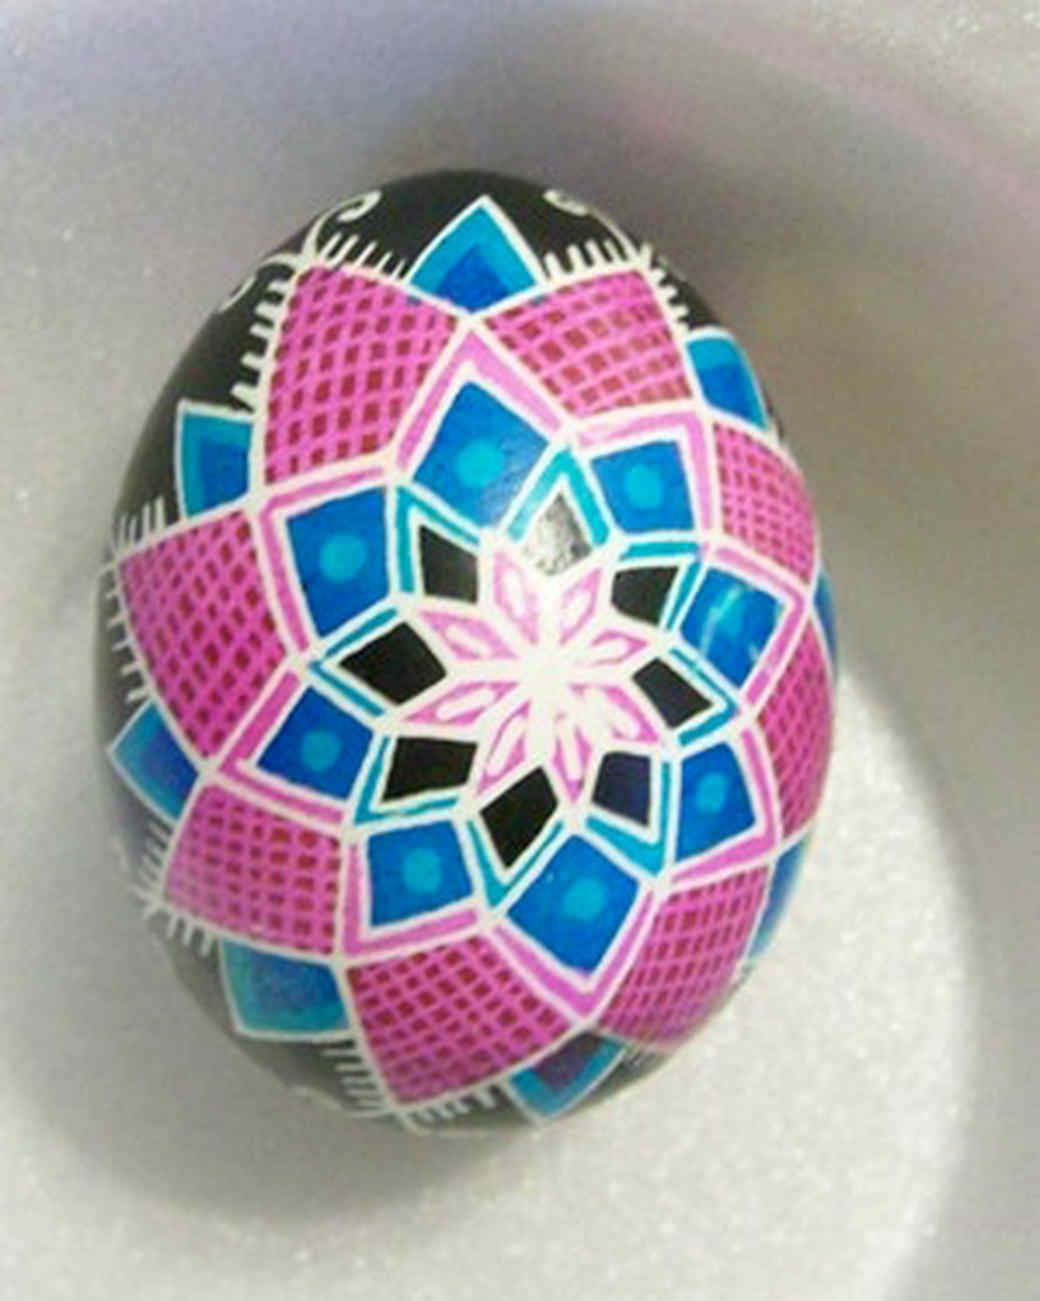 marthas-egg-hunt-georgia-sawhook-0414.jpg